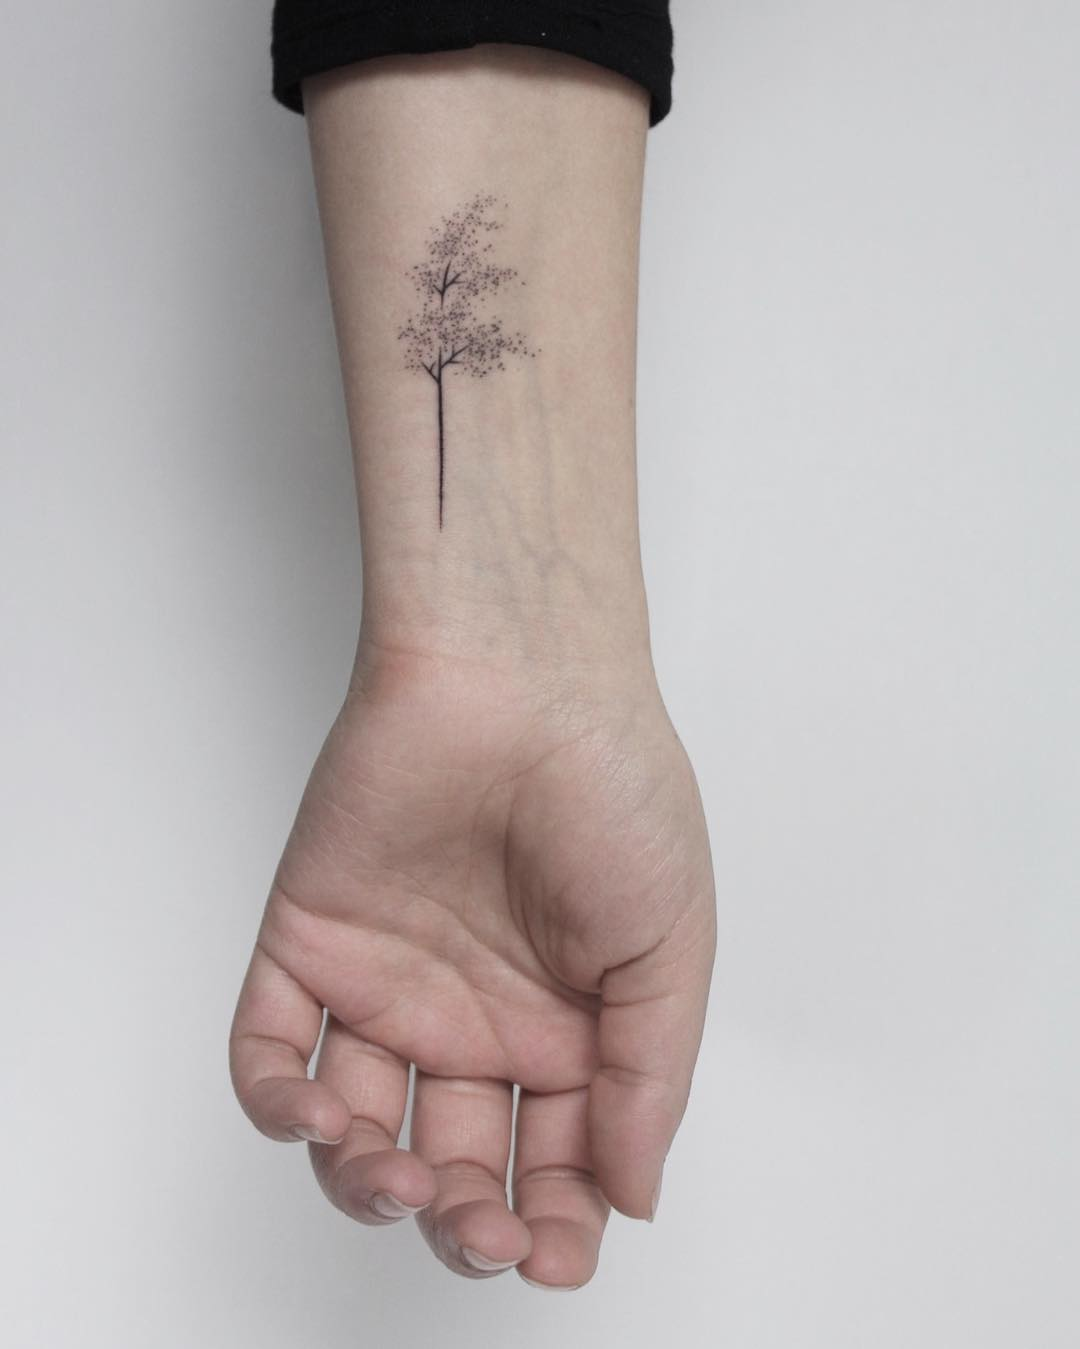 Hand-poked windy tree tattoo by Lara Maju